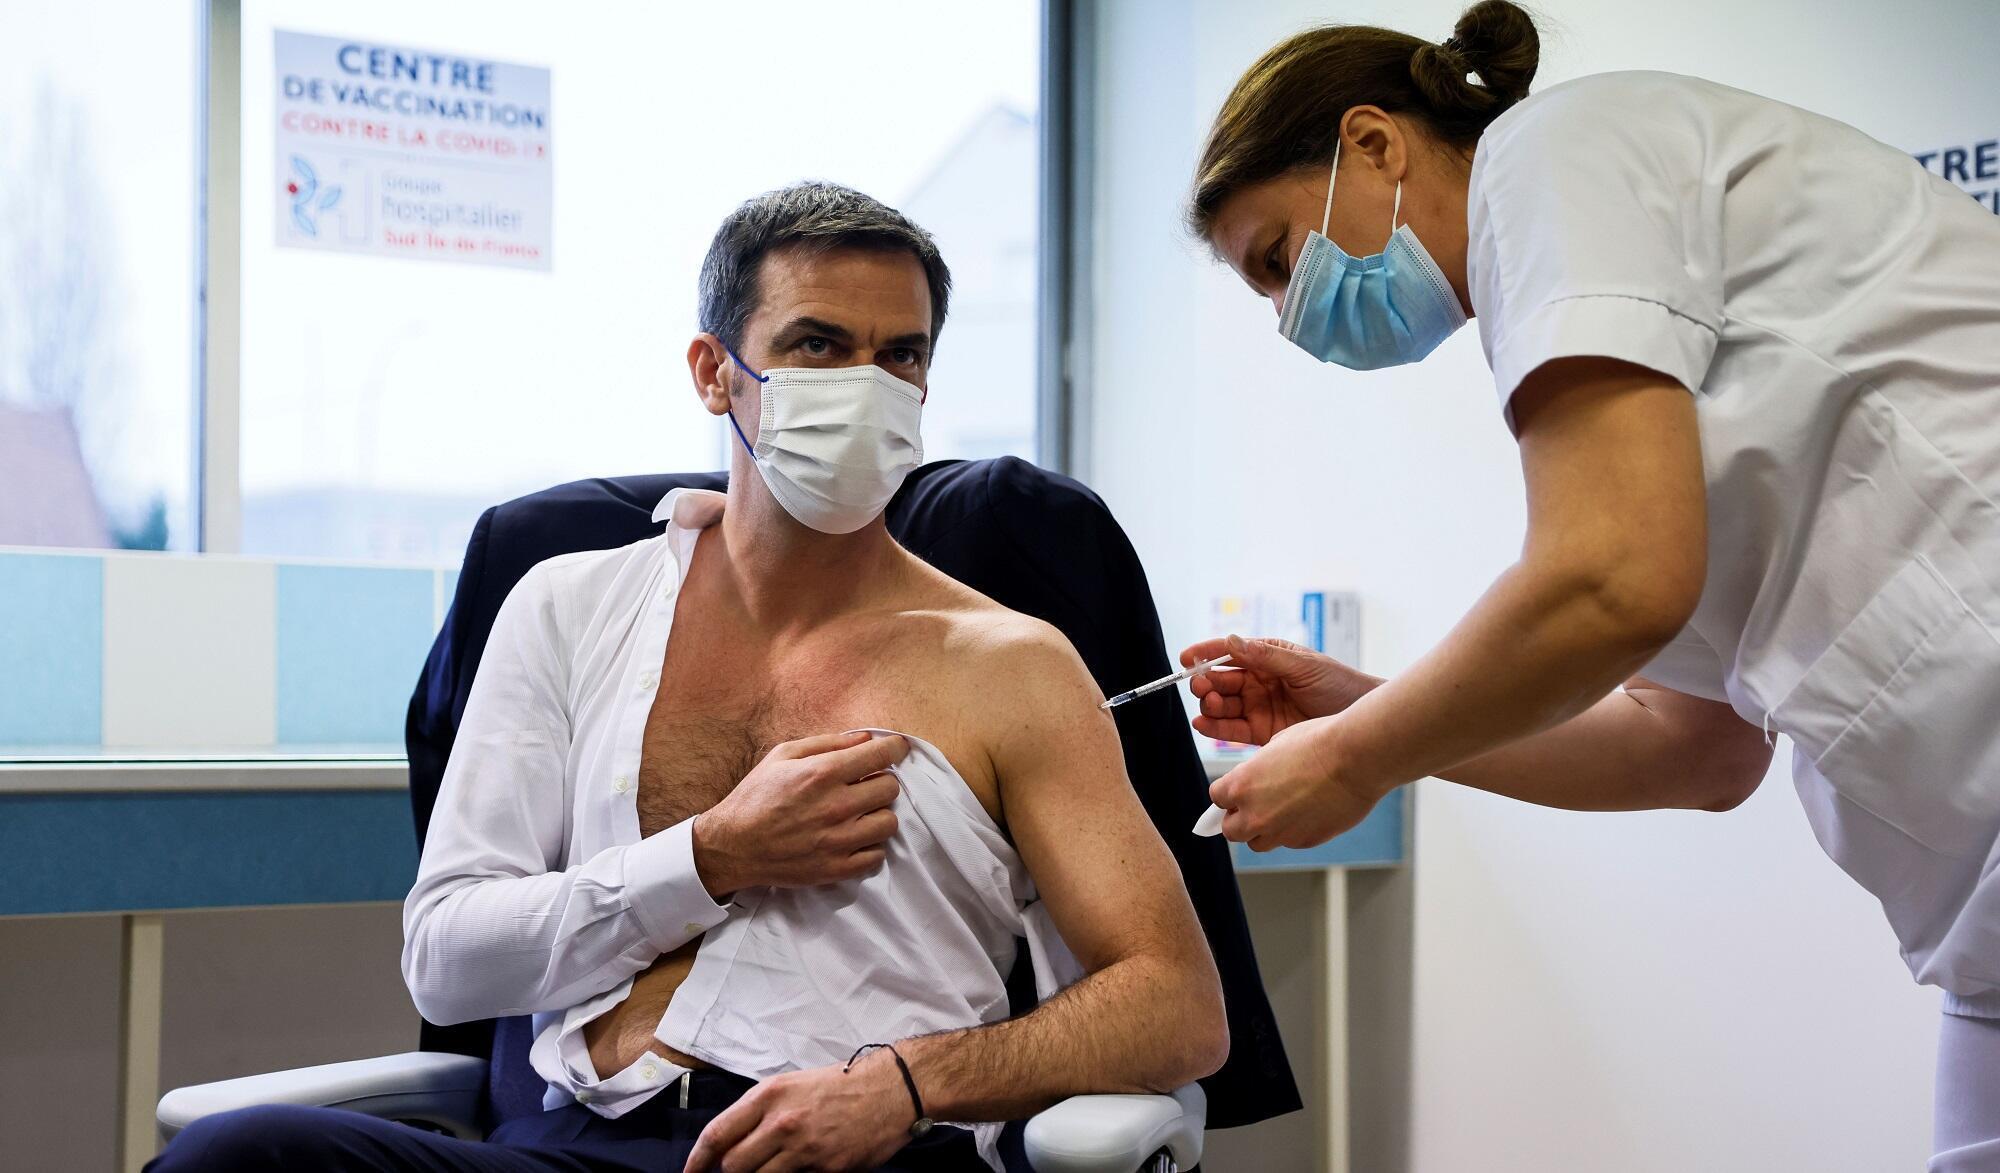 2021-02-08 france covid-19 coronavirus health minister olivier veran vaccine astrazeneca syringe injection